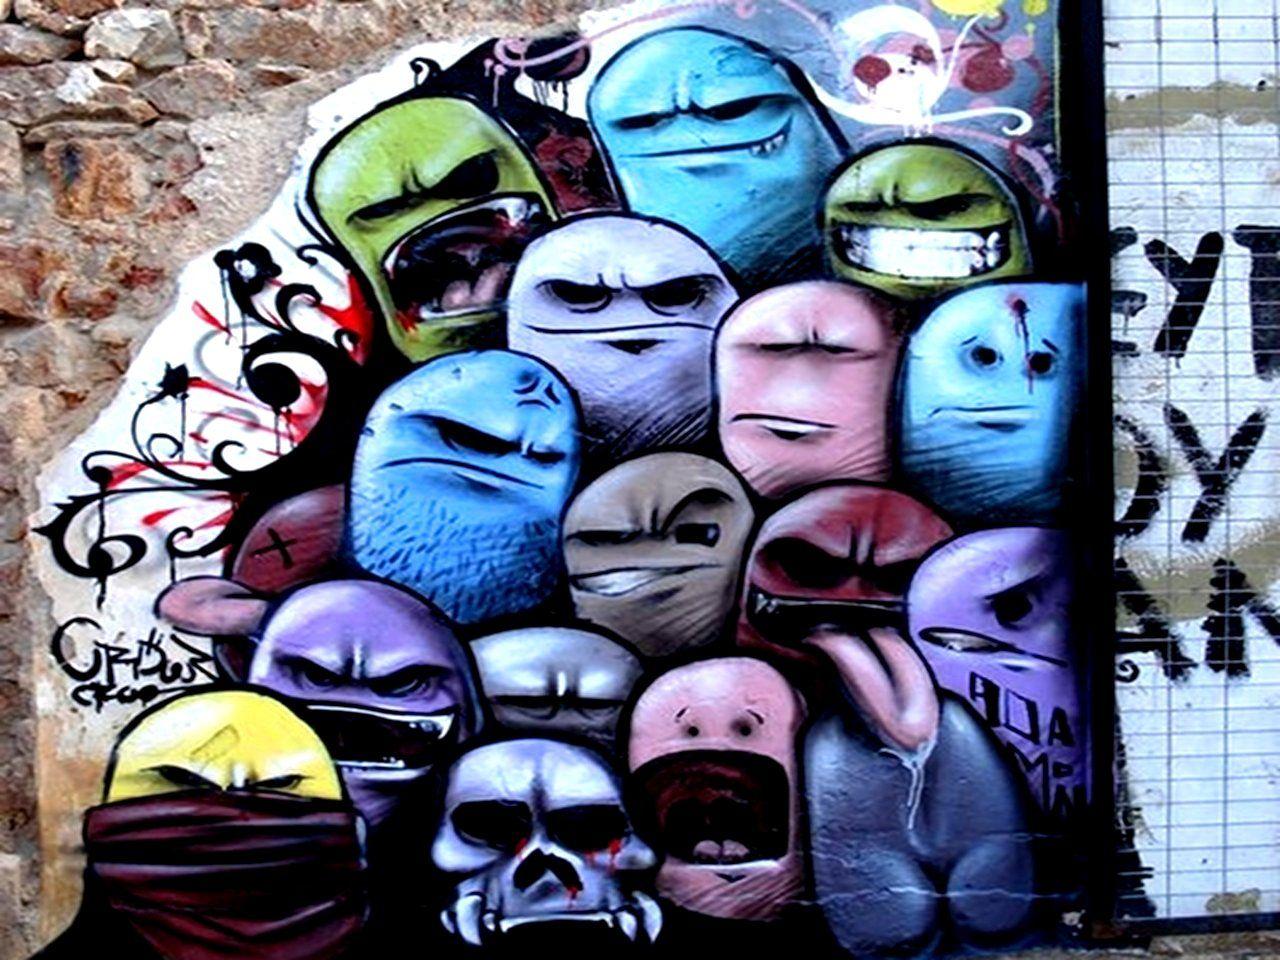 Graffiti Characters Hd Backgrounds 2021 Live Wallpaper Hd Graffiti Wallpaper Art Wallpaper Graffiti